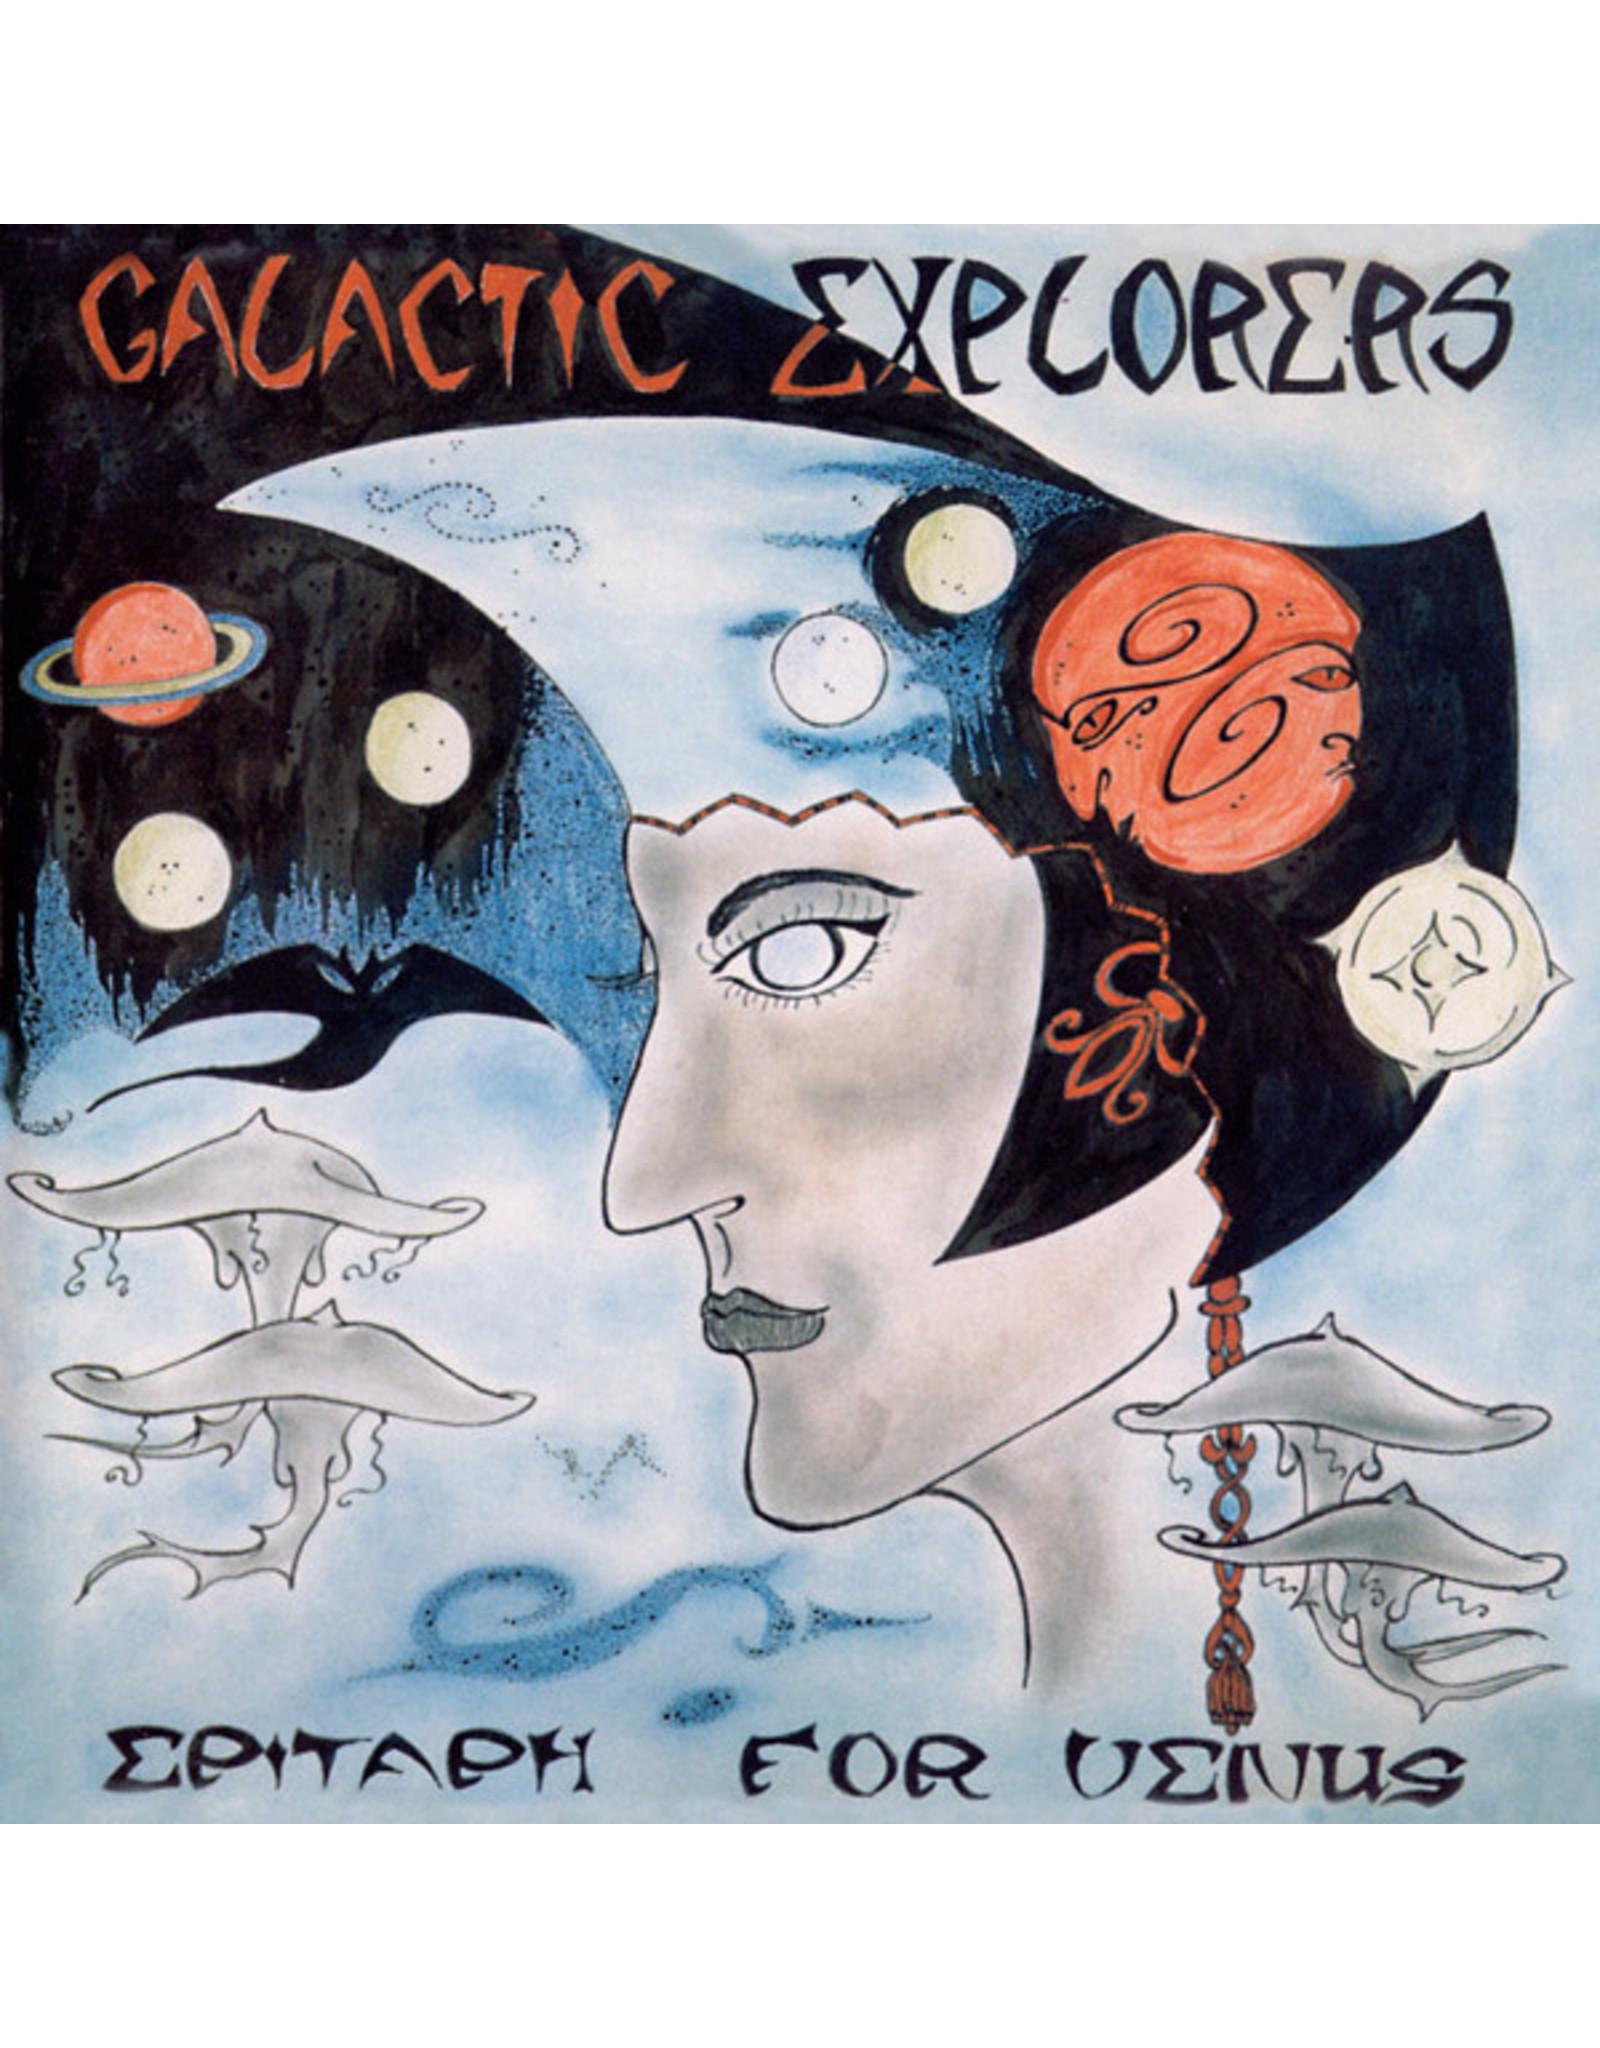 Mental Experience Galactic Explorers: Epitaph for Venus LP